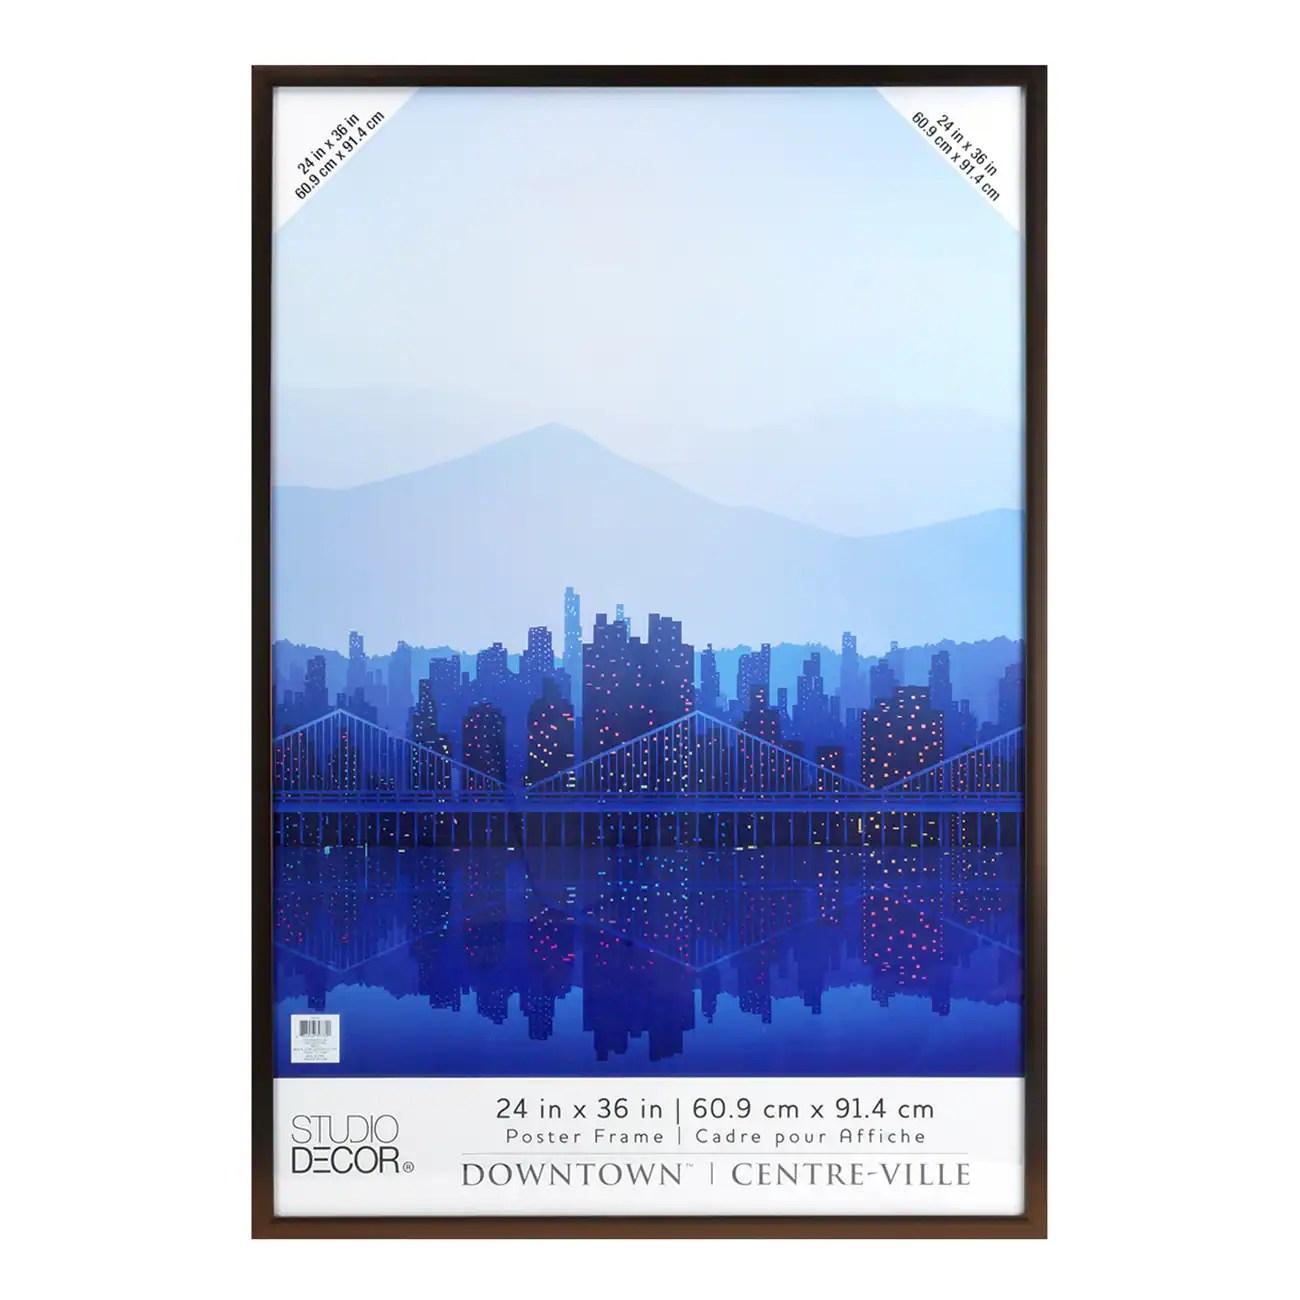 bronze 24 x 36 poster frame by studio decor